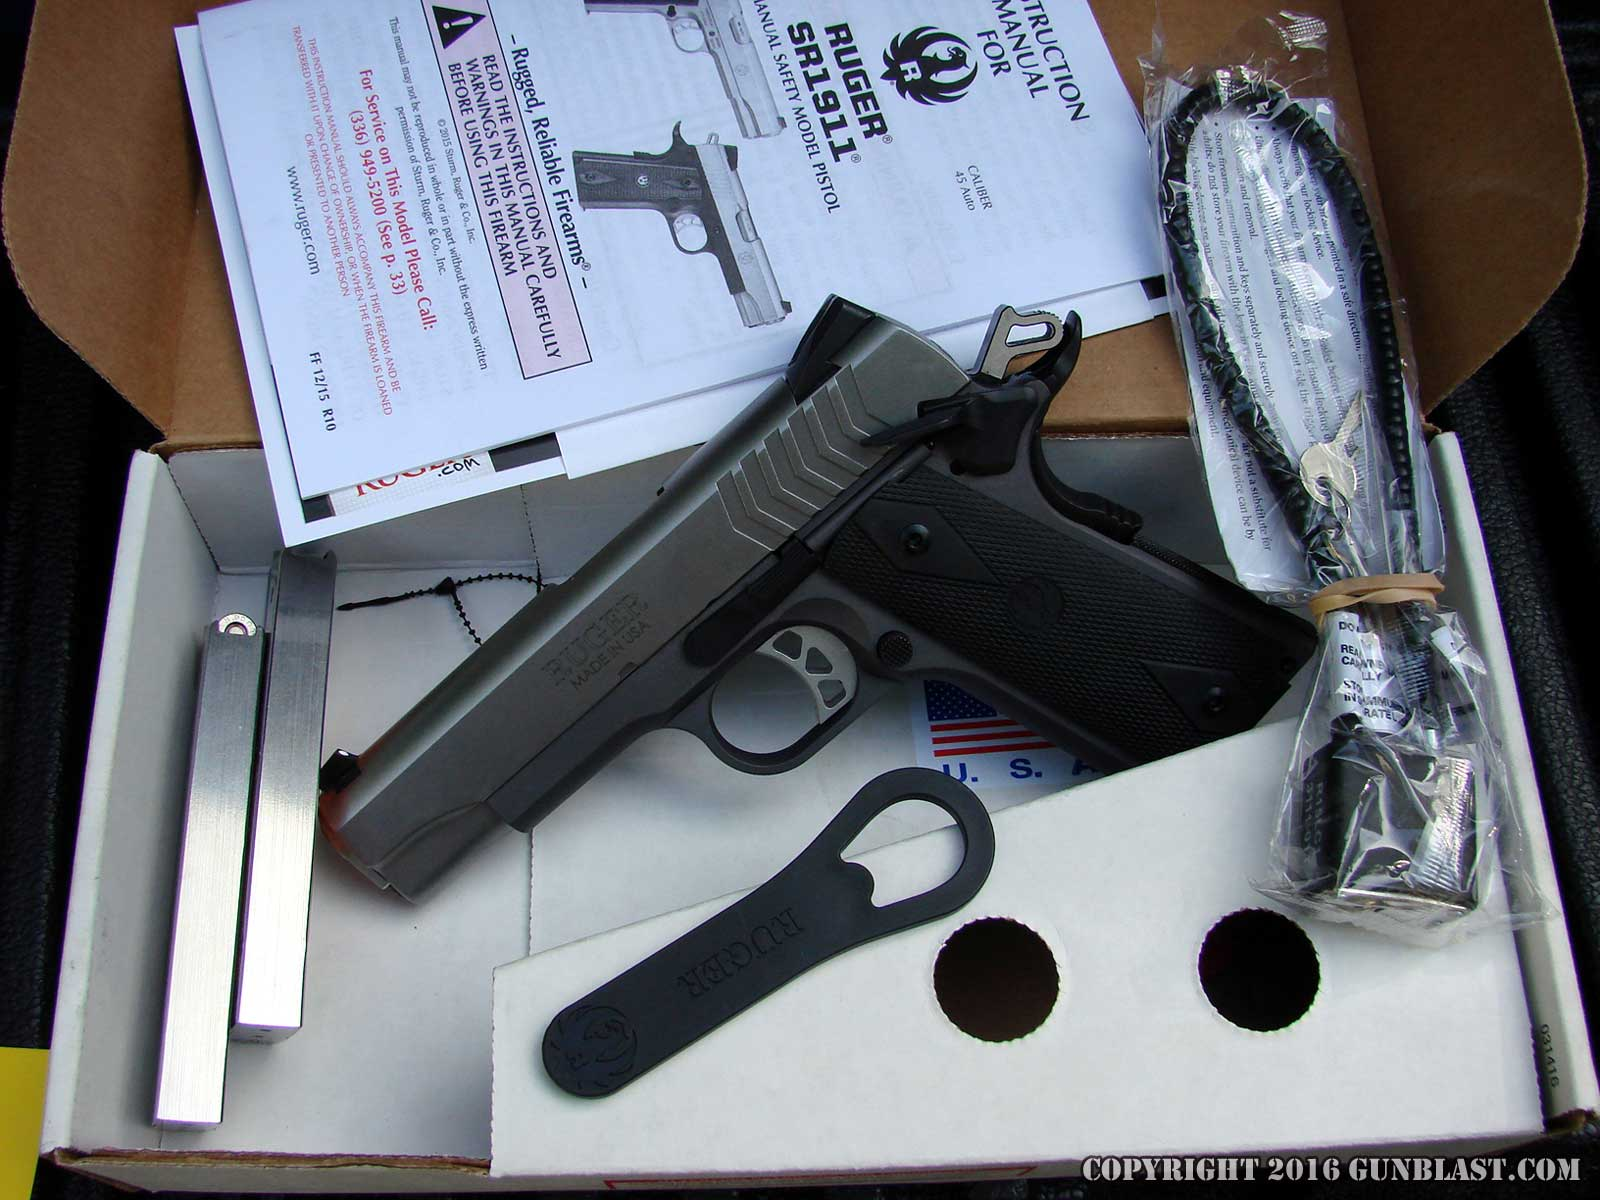 Ruger Lightweight 9x19mm SR1911 Semi-Automatic Pistol